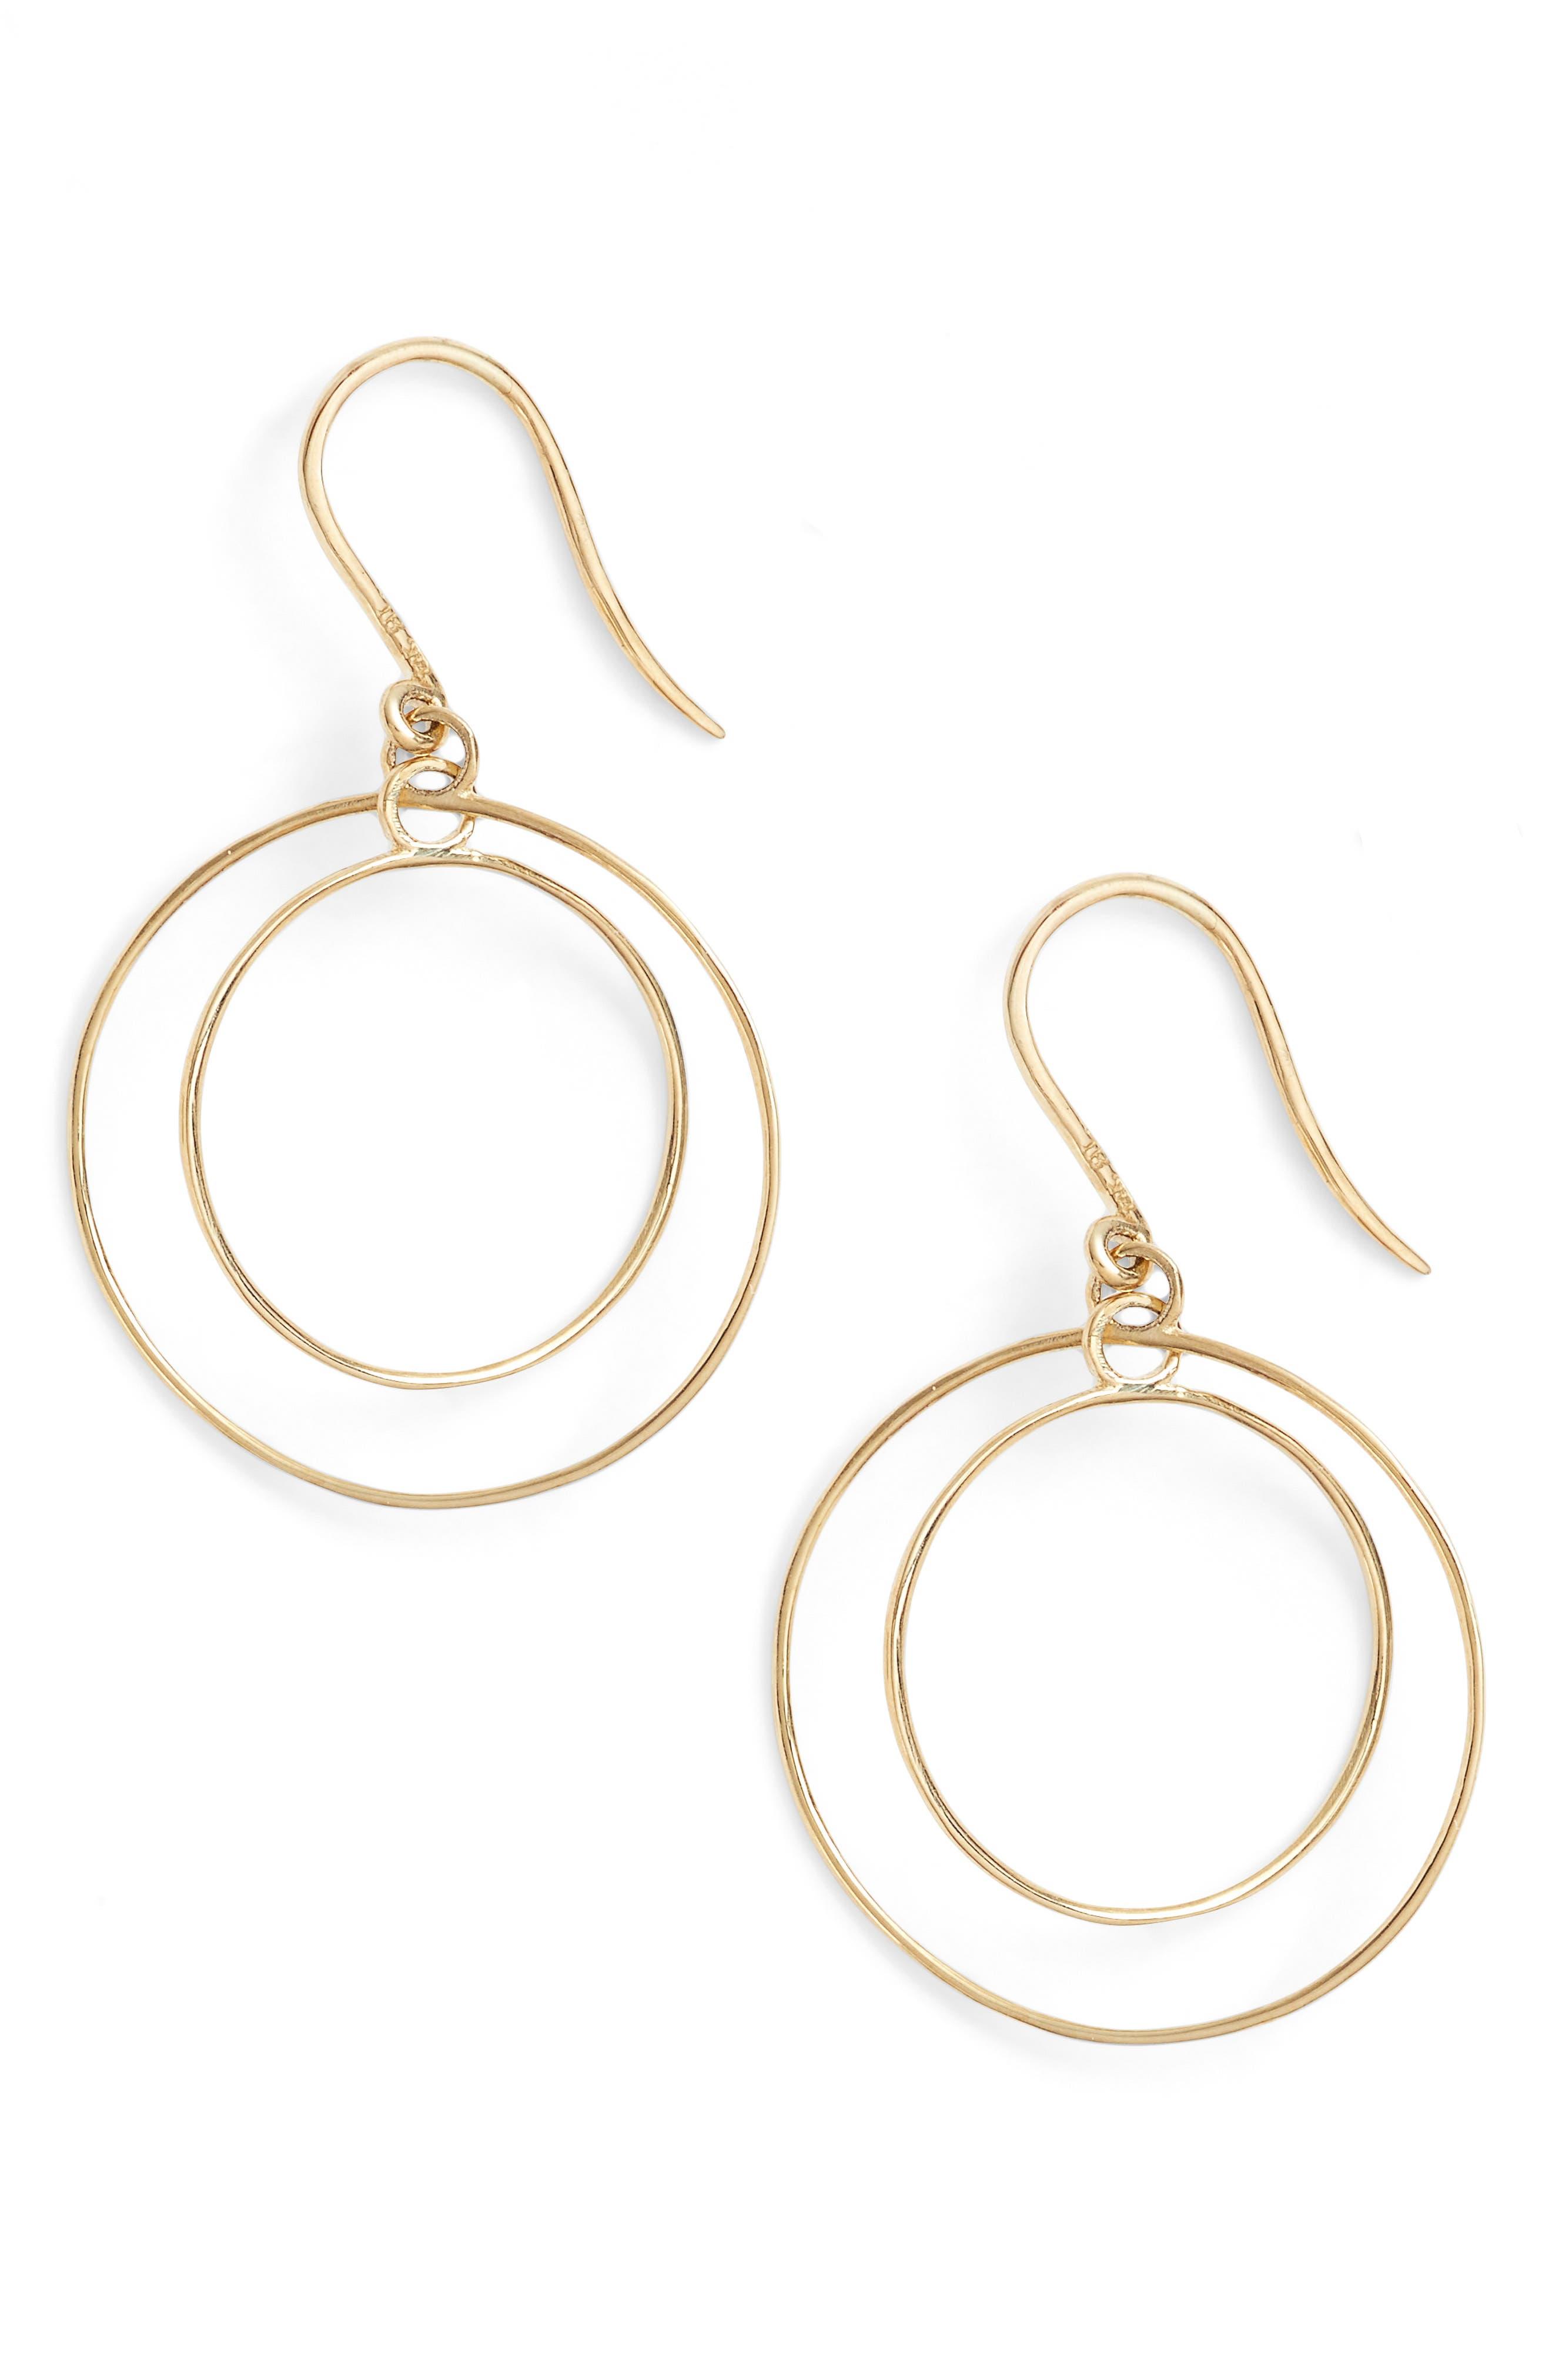 Double Circle Orbital Drop Earrings,                         Main,                         color, YELLOW GOLD